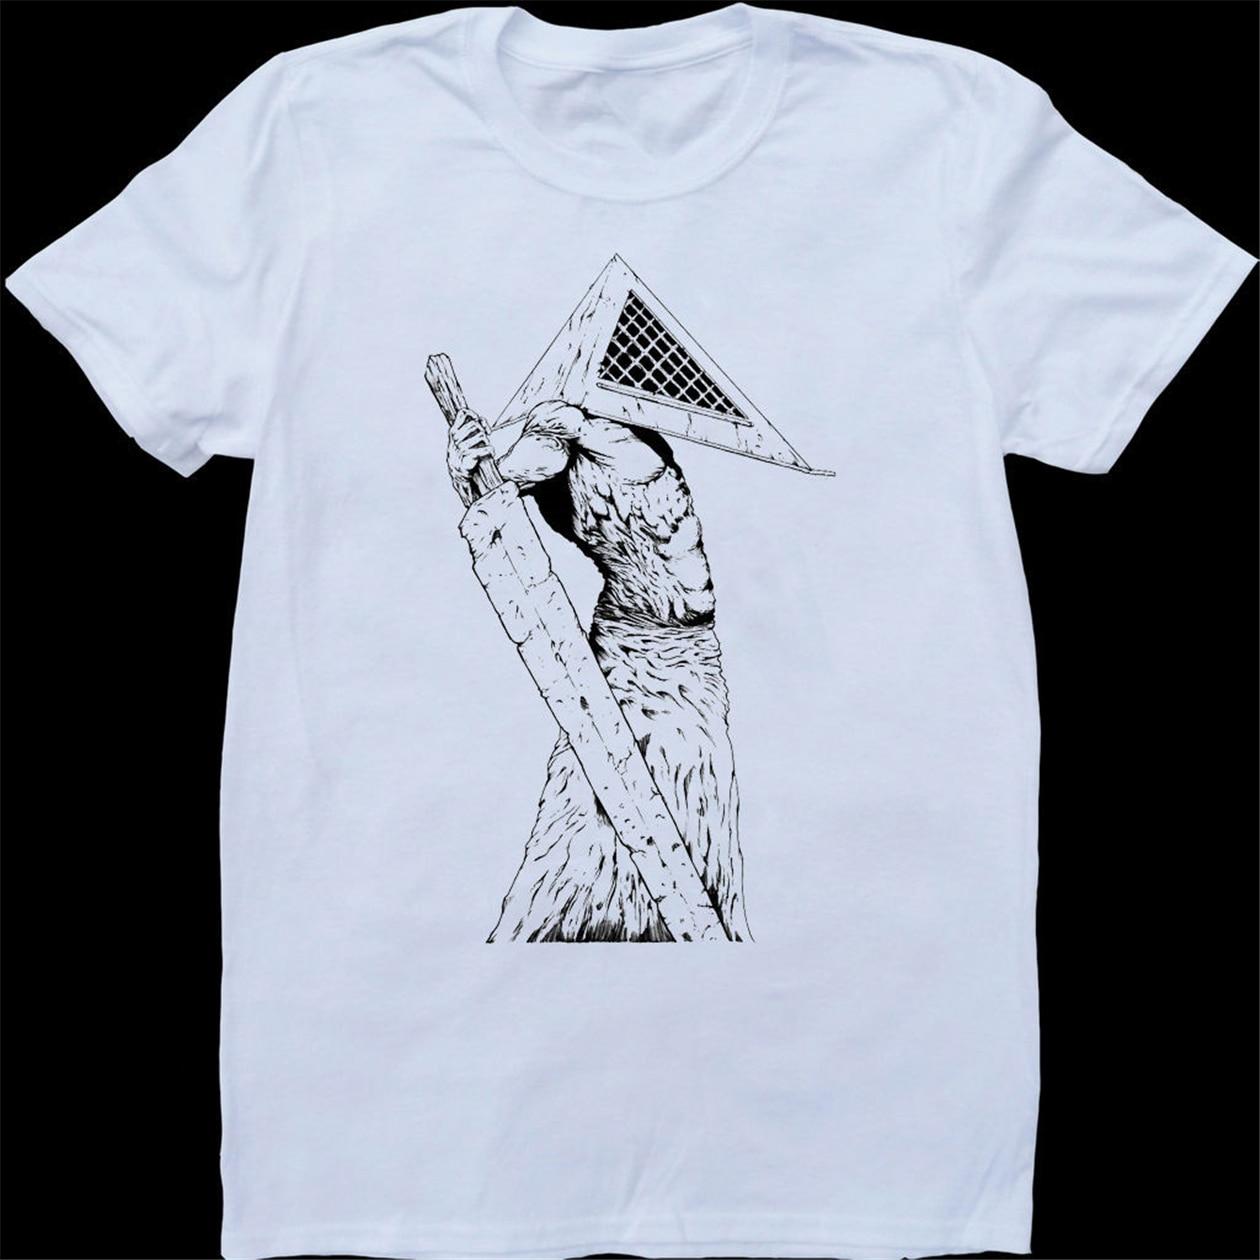 Camiseta de algodón, camiseta personalizada, Camiseta de algodón, informal, silencioso, piramidal, blanco